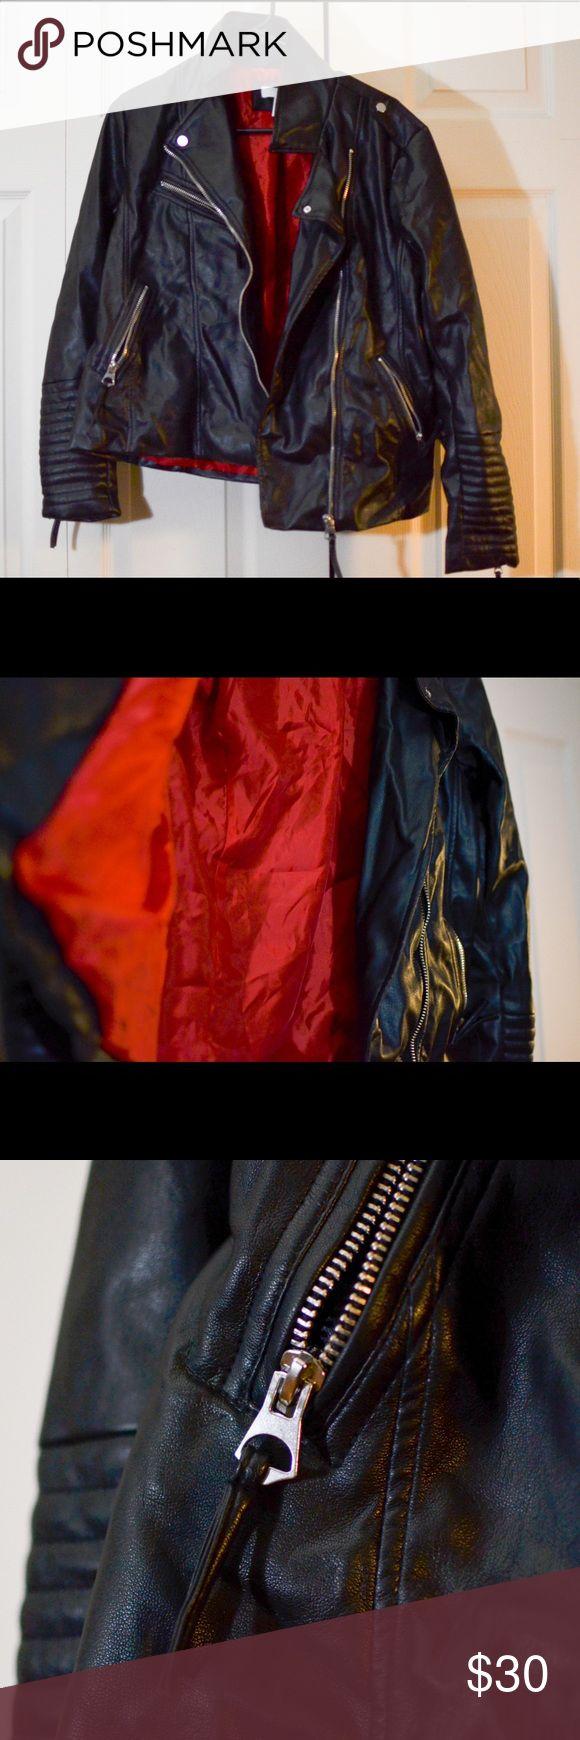 H&M Women's Faux Leather Jacket Black Biker jacket with